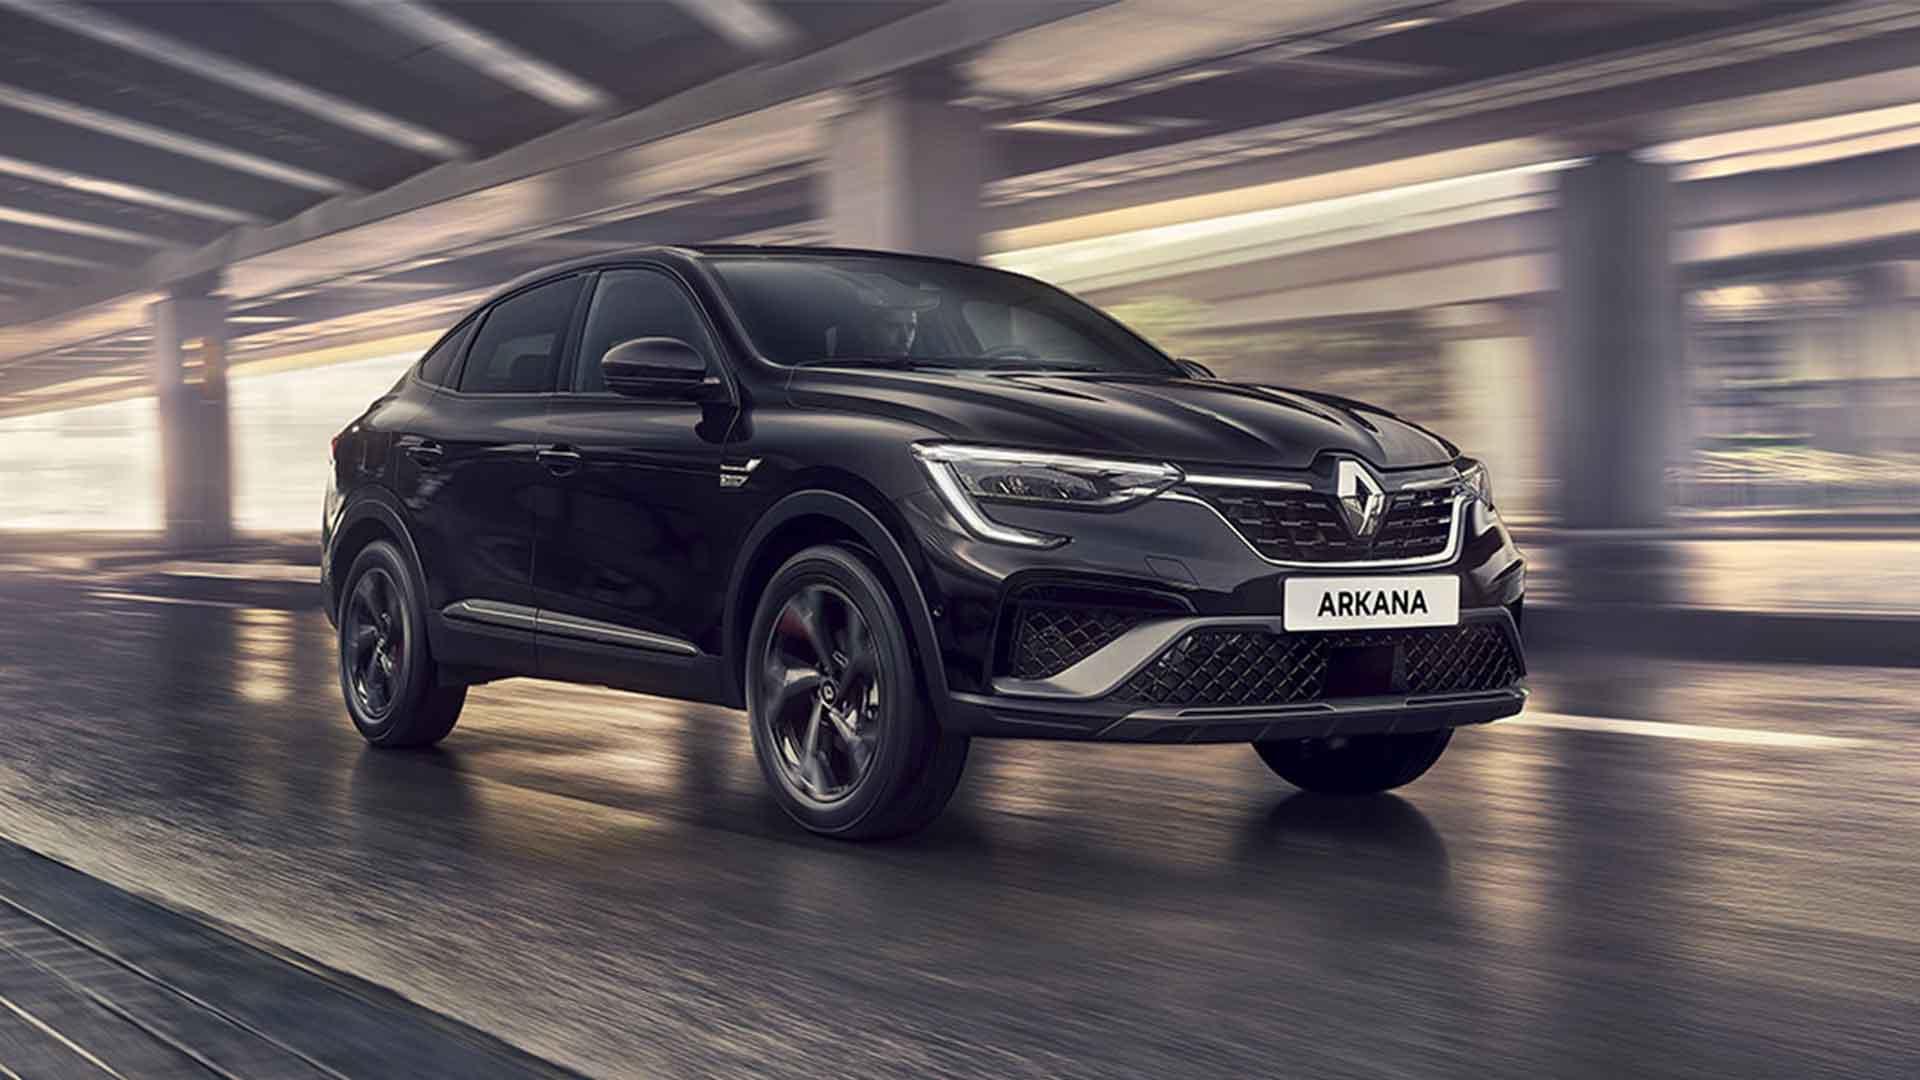 Gruppo Piemme Car - Renault Arkana